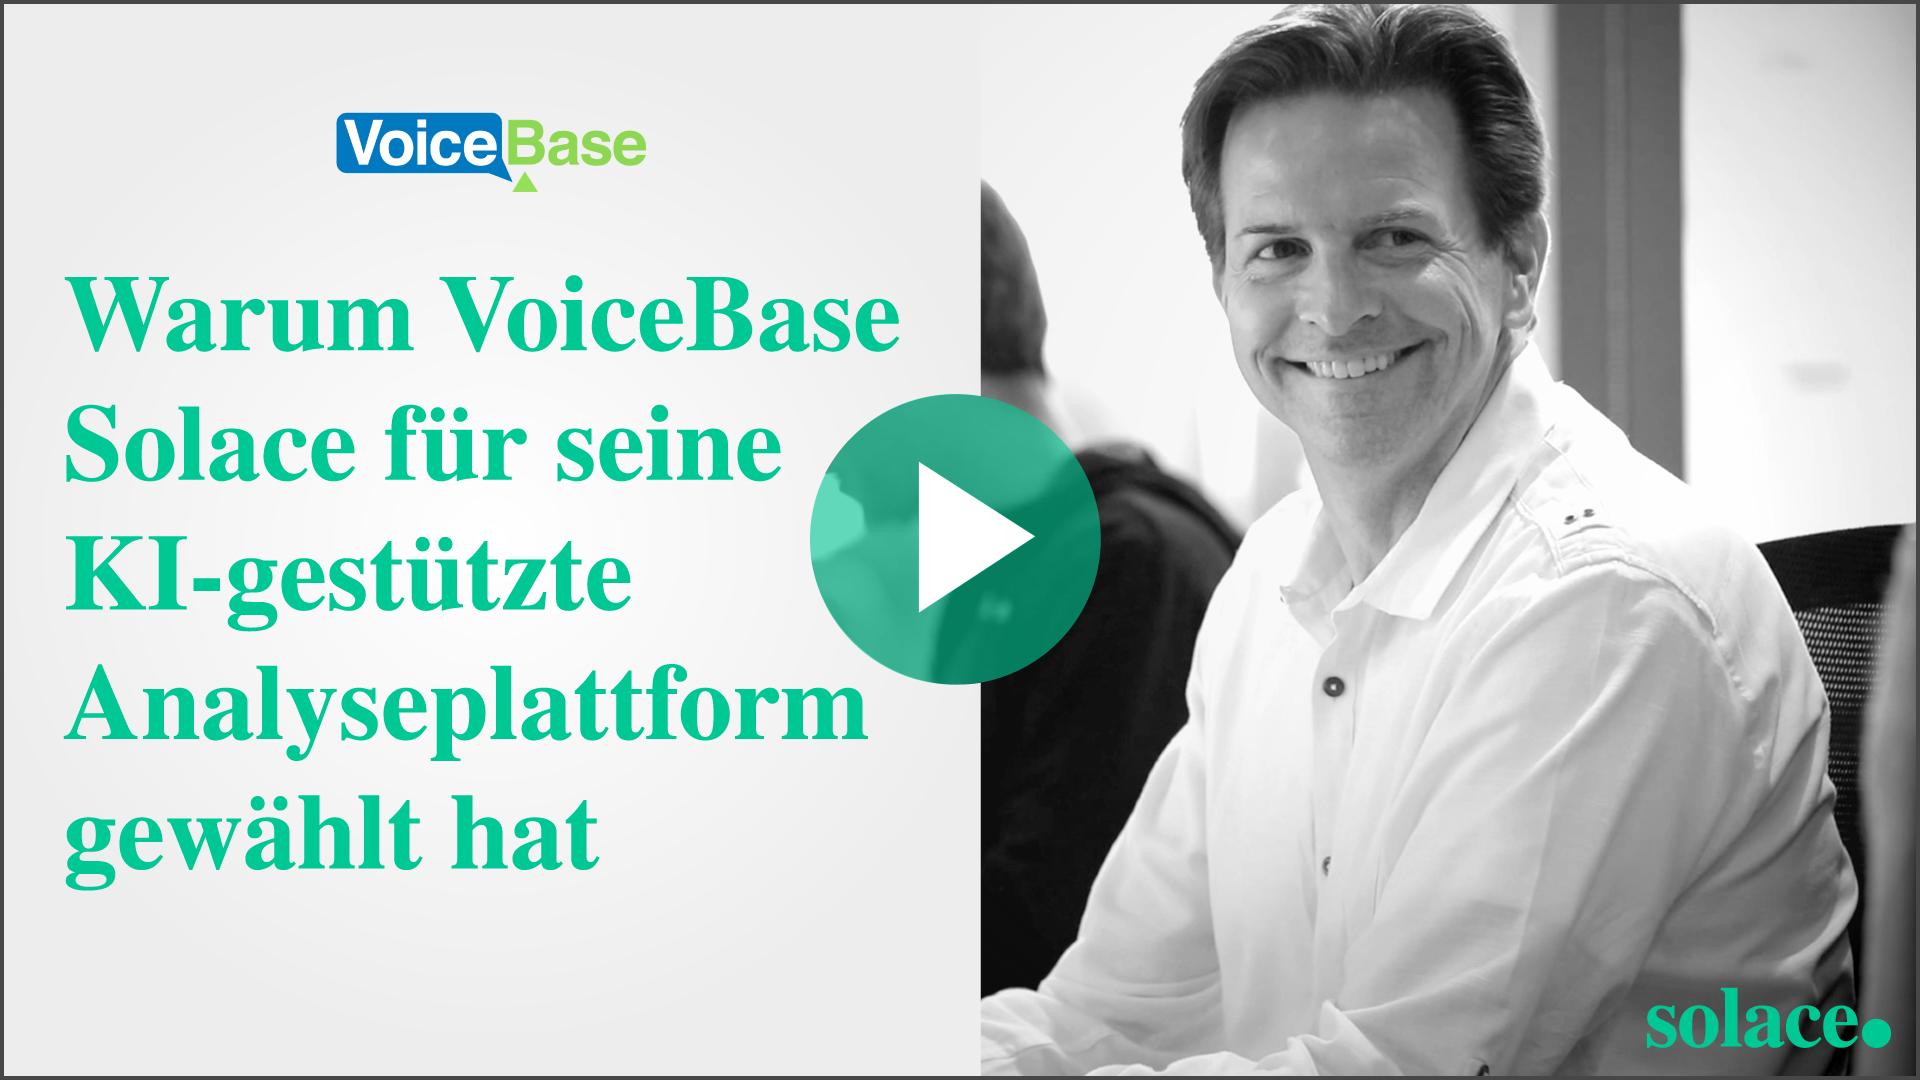 VoiceBase  + Soalce